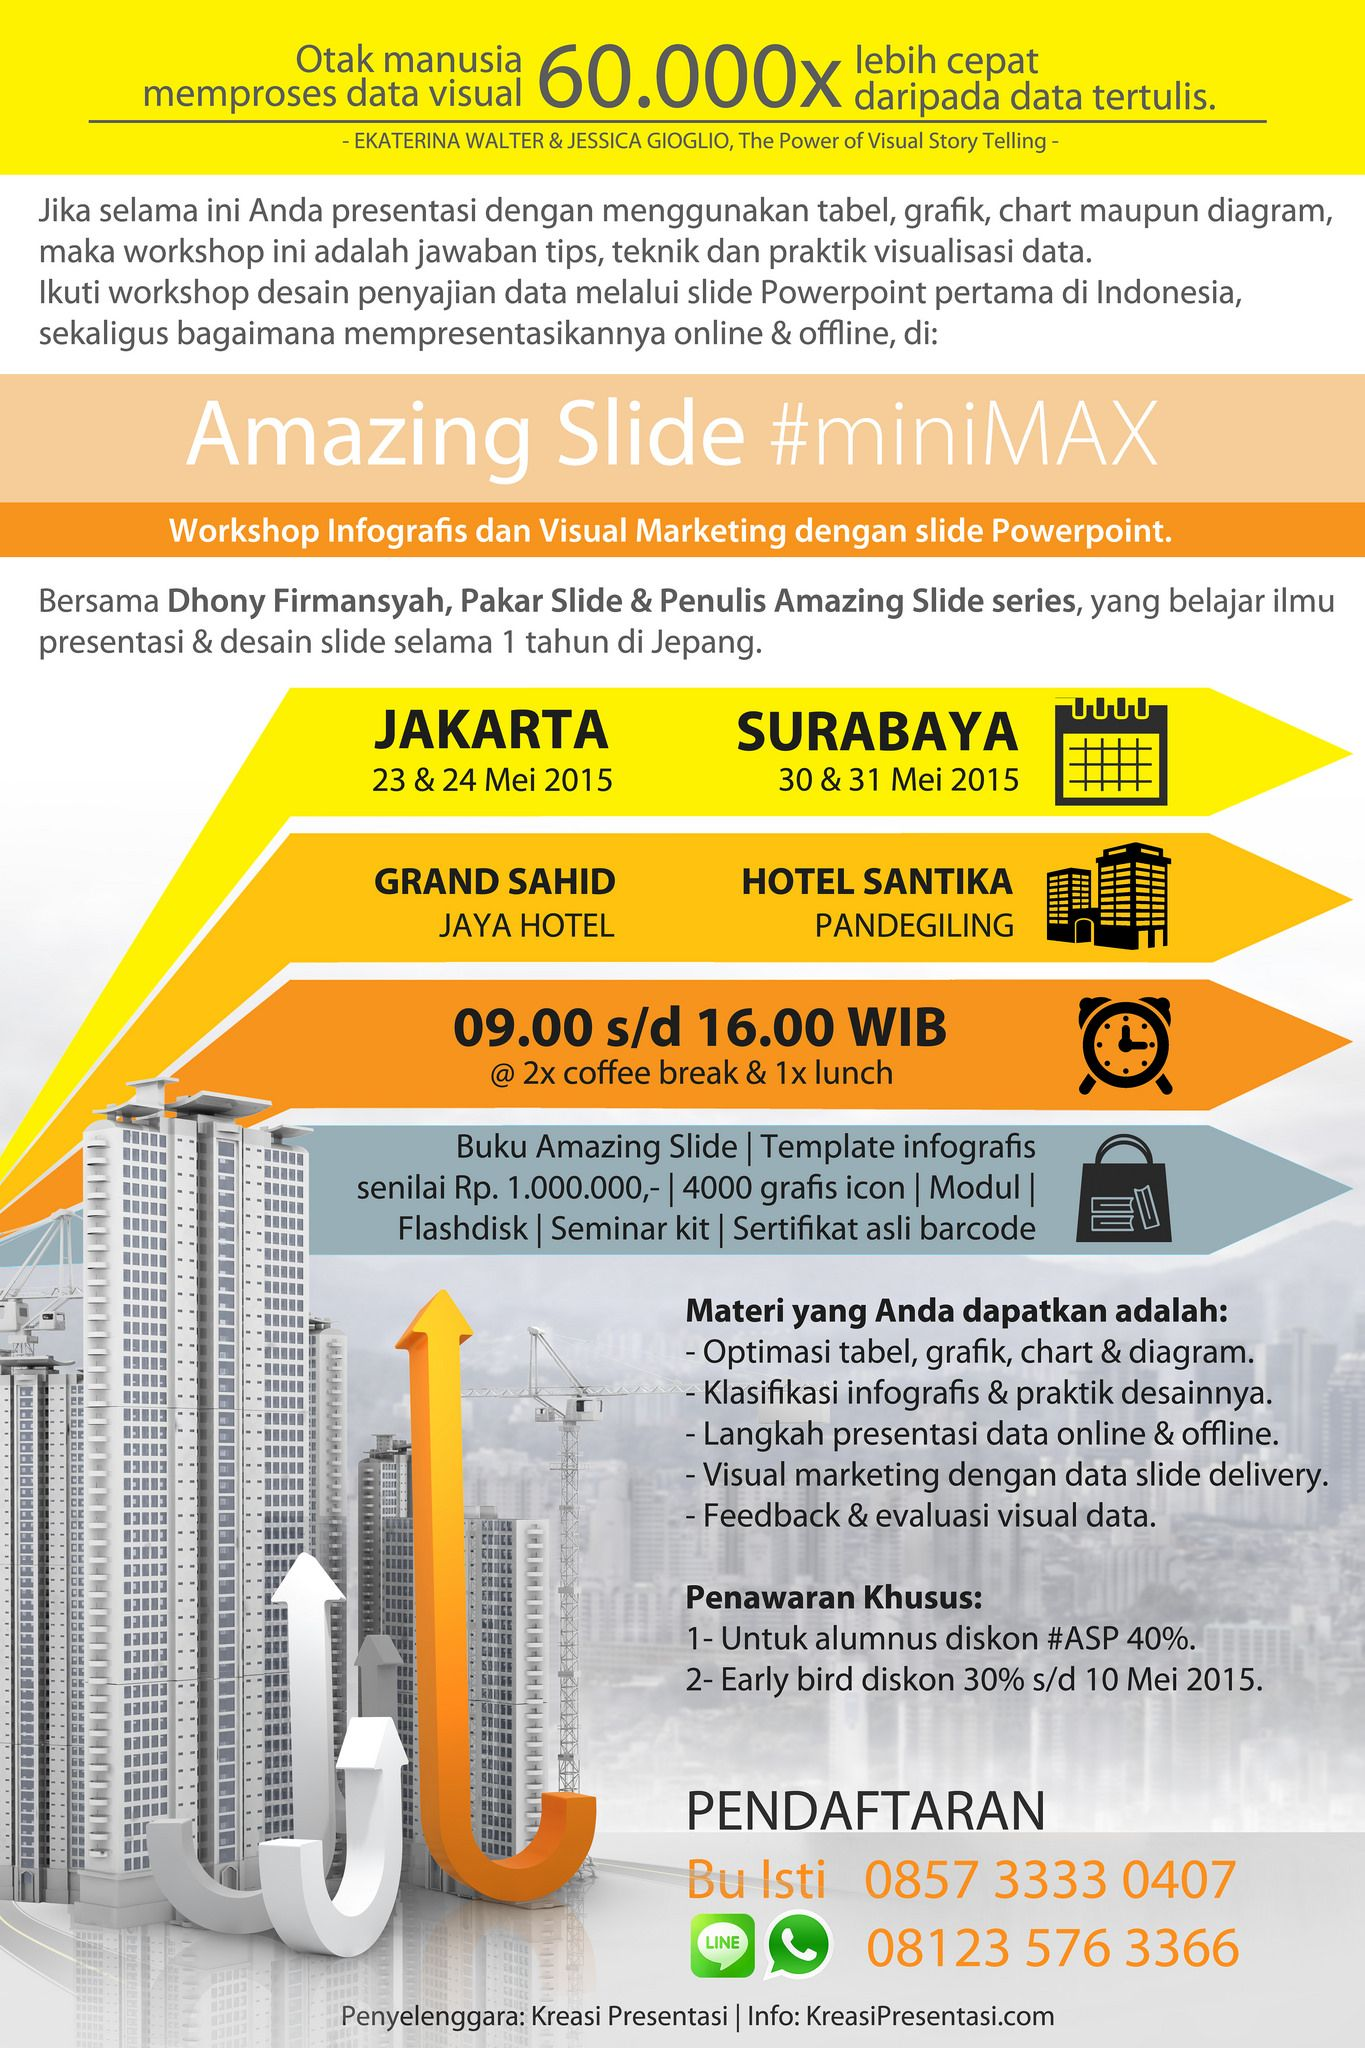 Pelatihan infografis visual marketing bersama pakar slide cp pelatihan infografis visual marketing bersama pakar slide cp 0857 3333 0407 ccuart Images